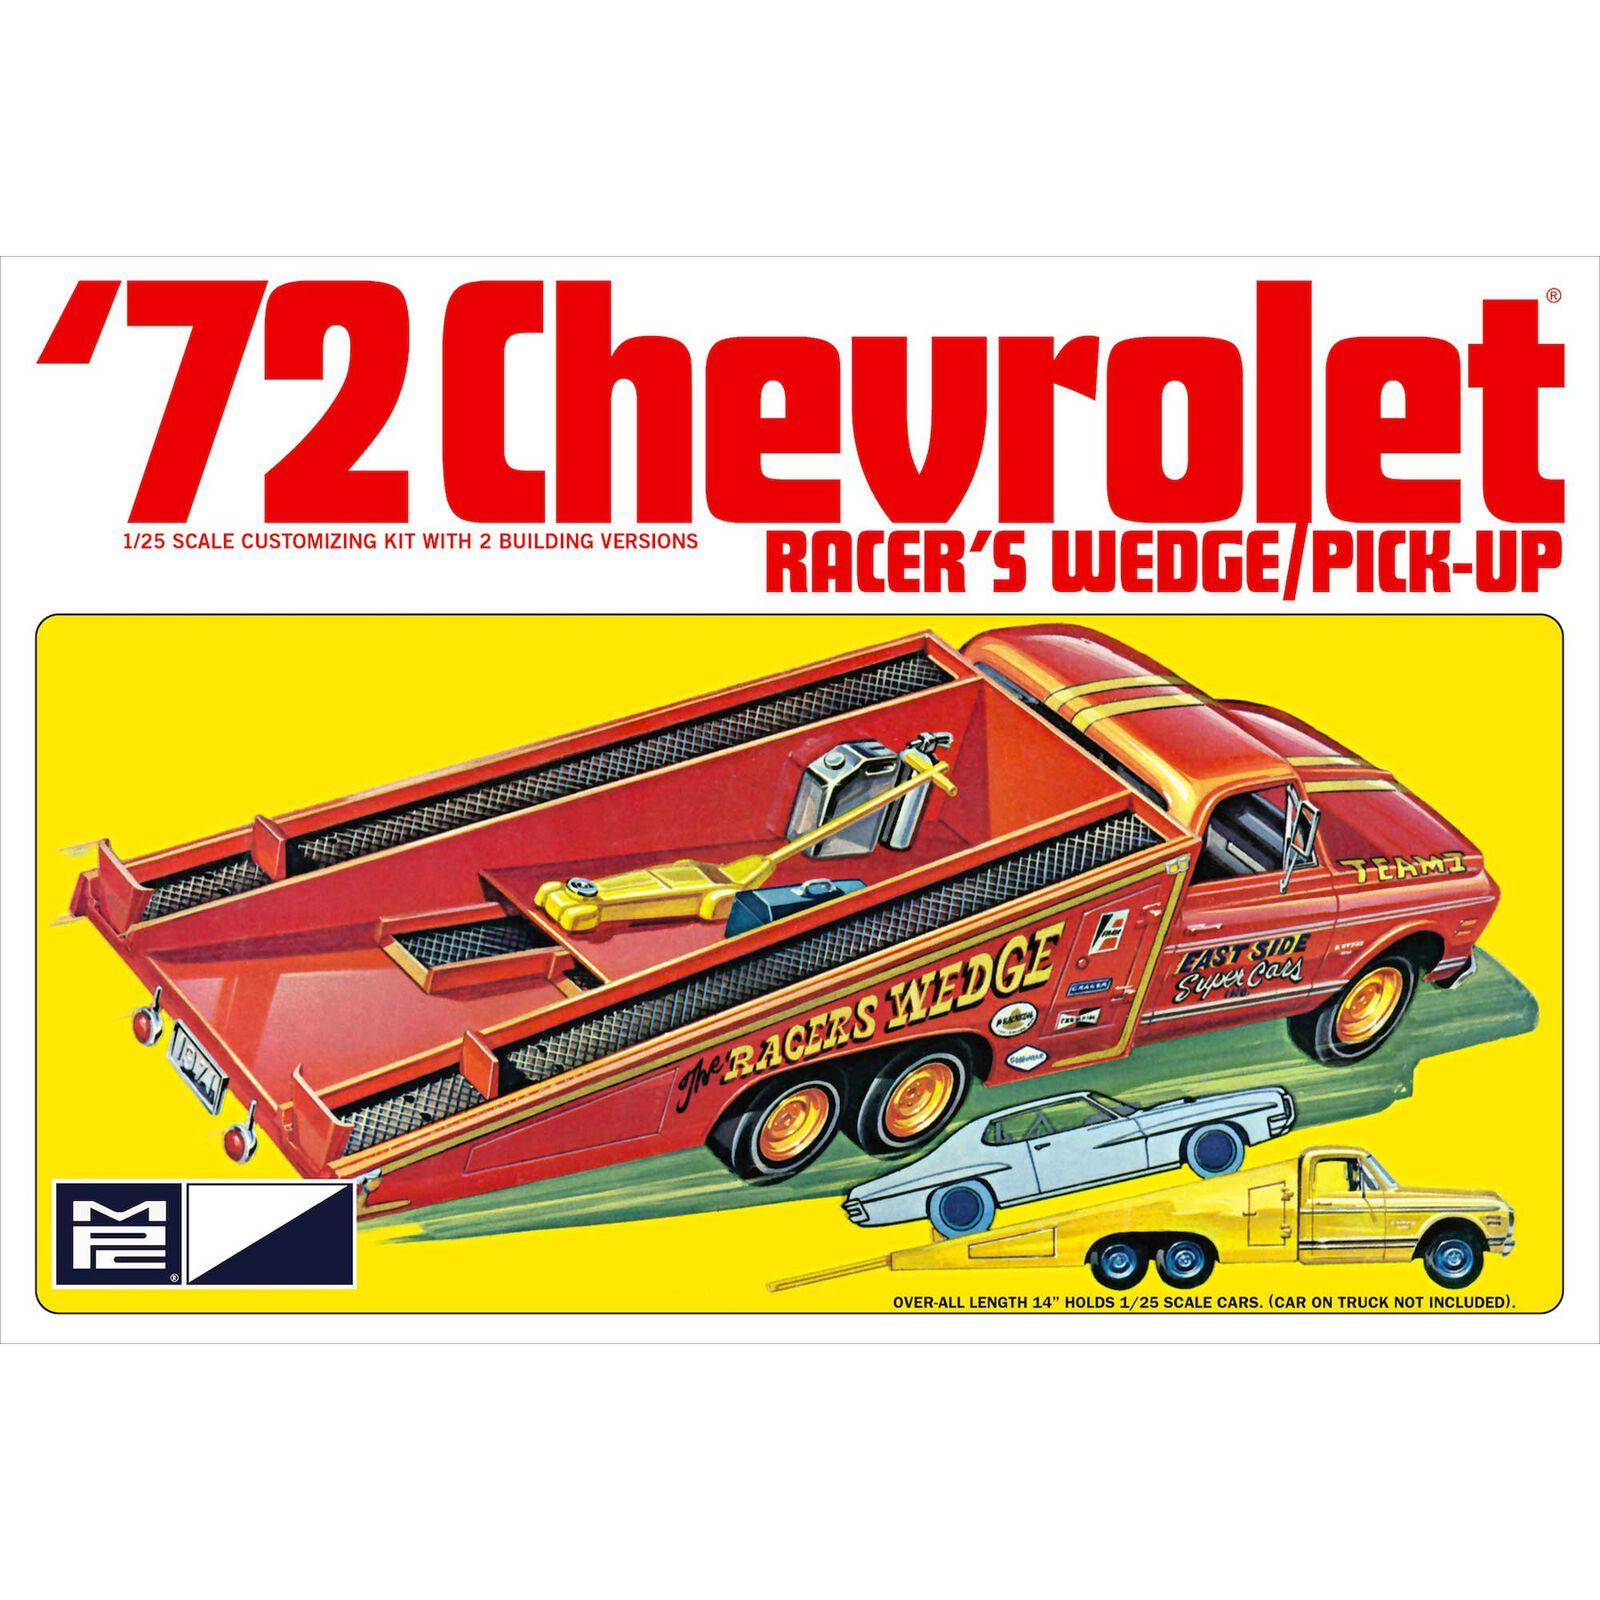 1/25 1972 Chevy Racer's Wedge Pick Up Model Kit